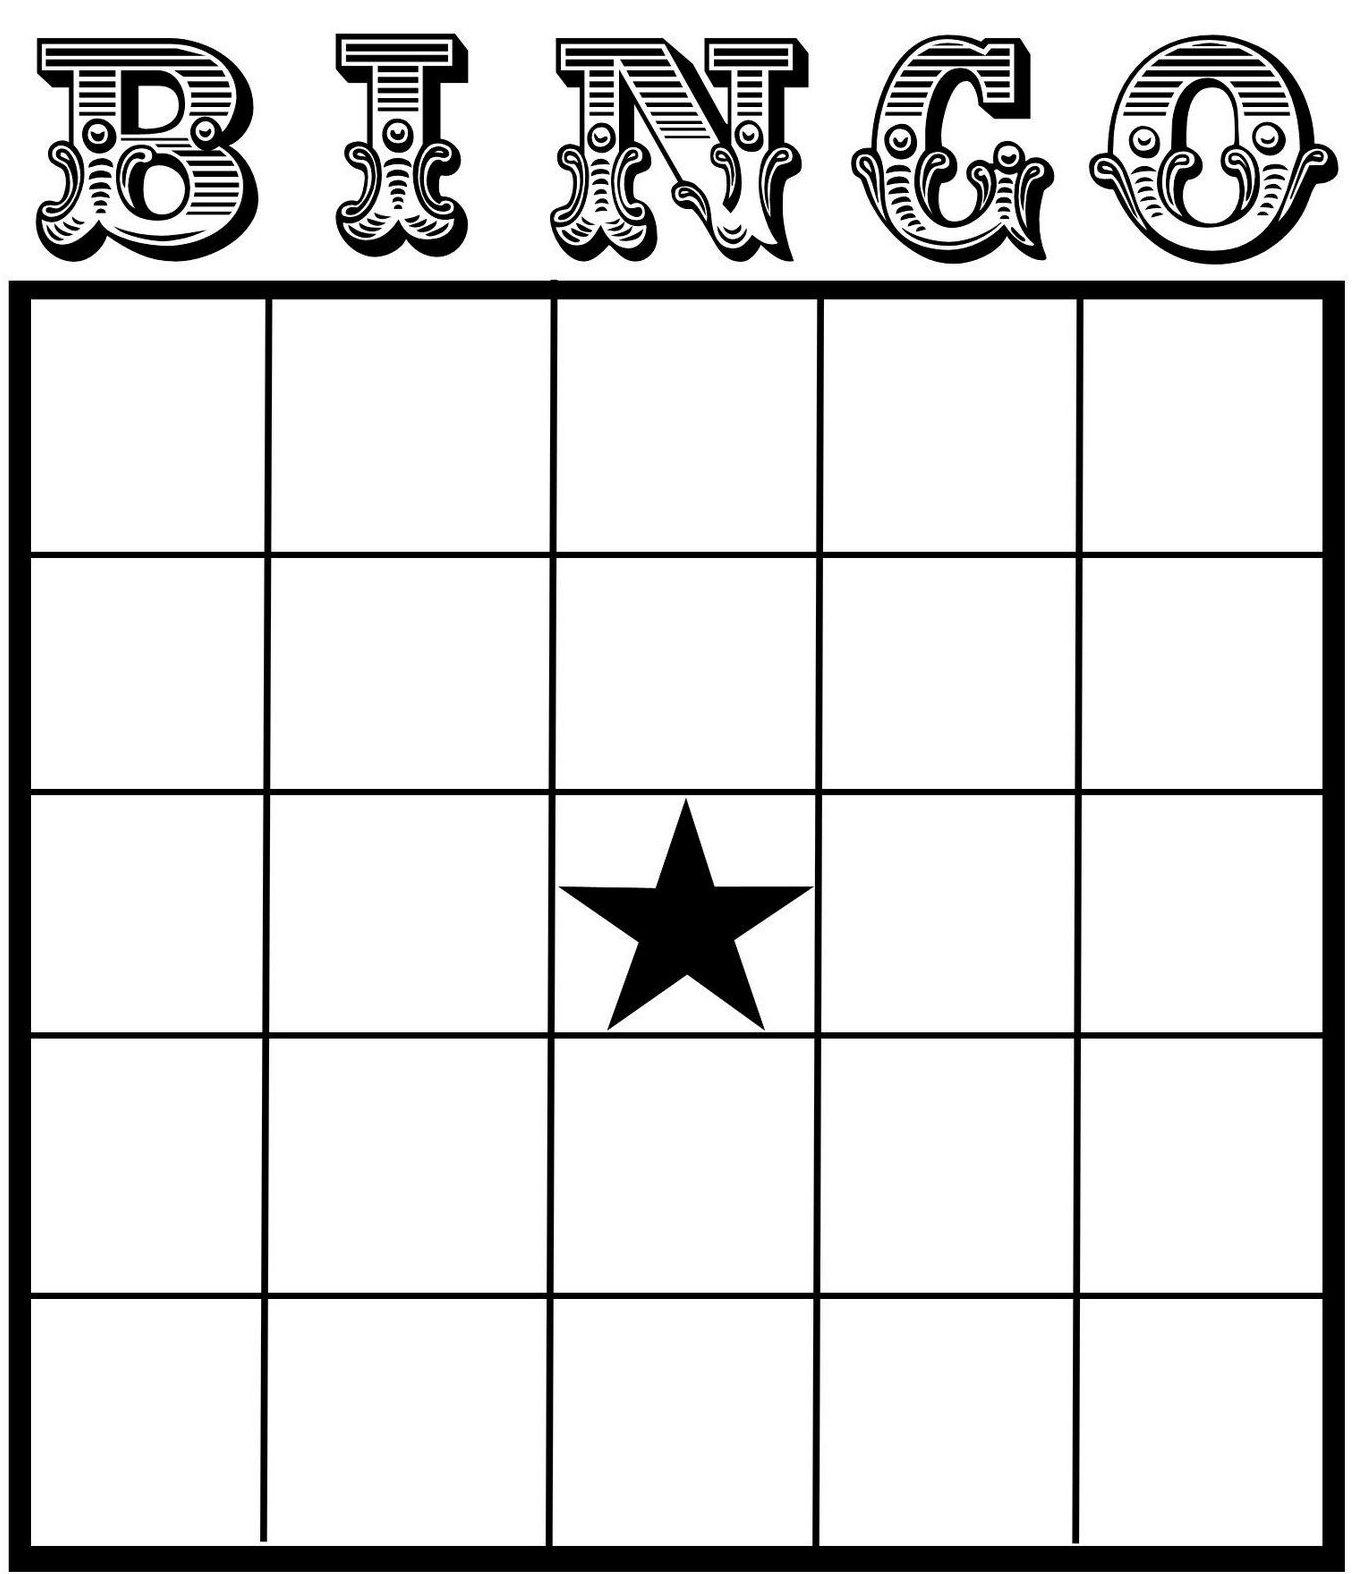 Free Printable Bingo Card Template - Set Your Plan & Tasks With Best - Free Printable Bingo Cards With Numbers